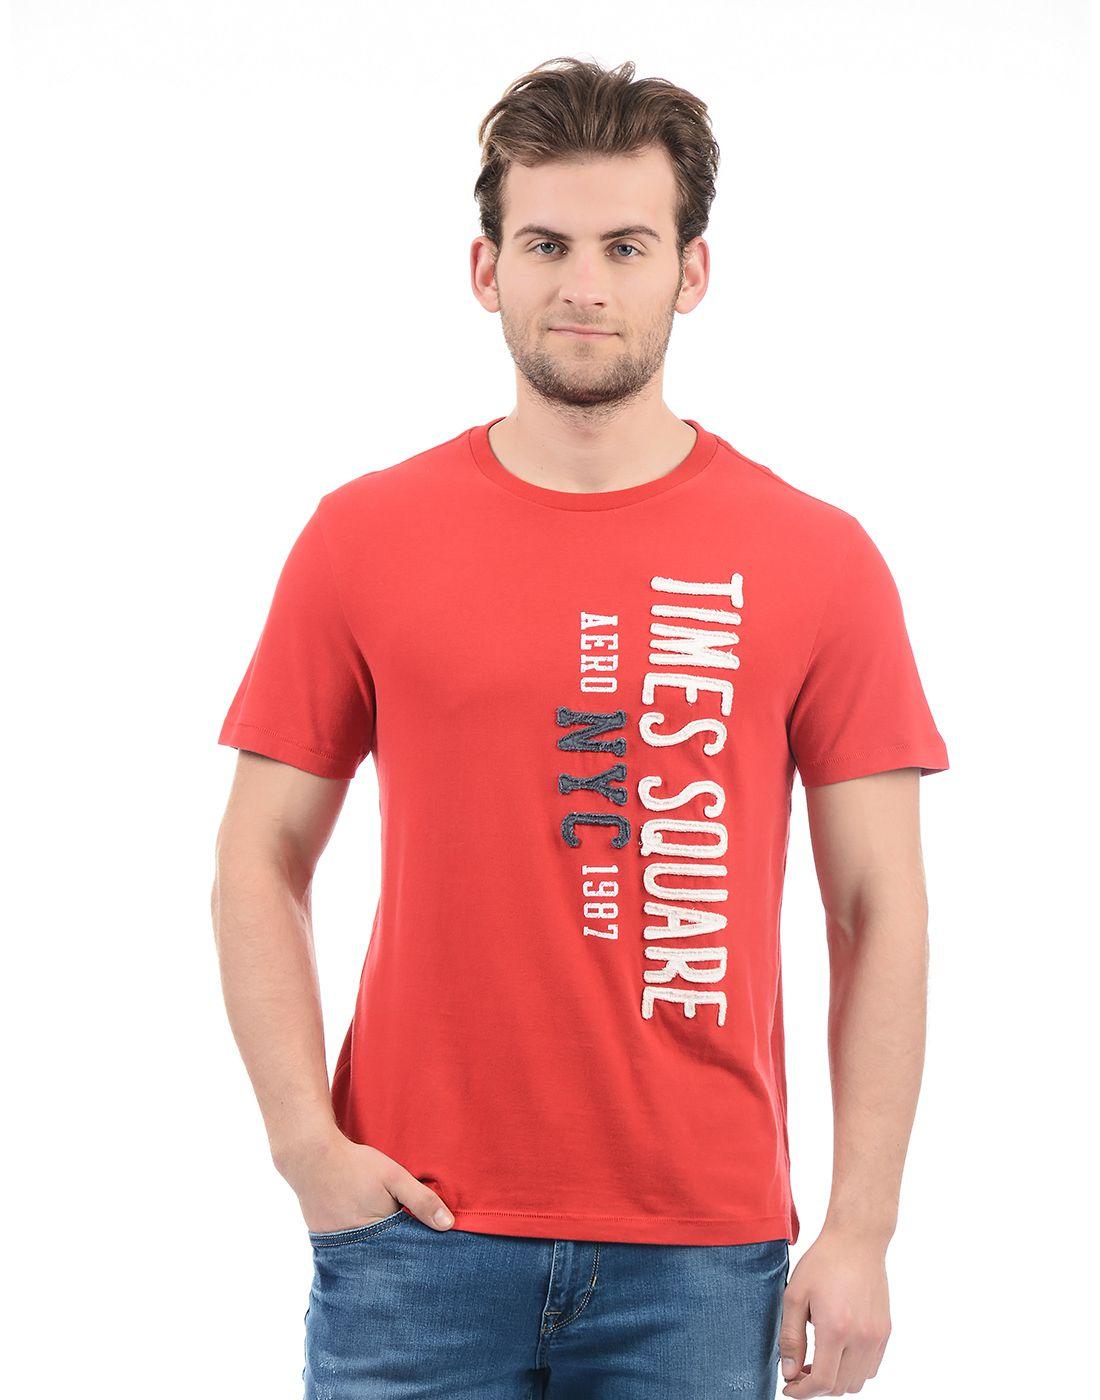 Aeropostale Red Round T-Shirt